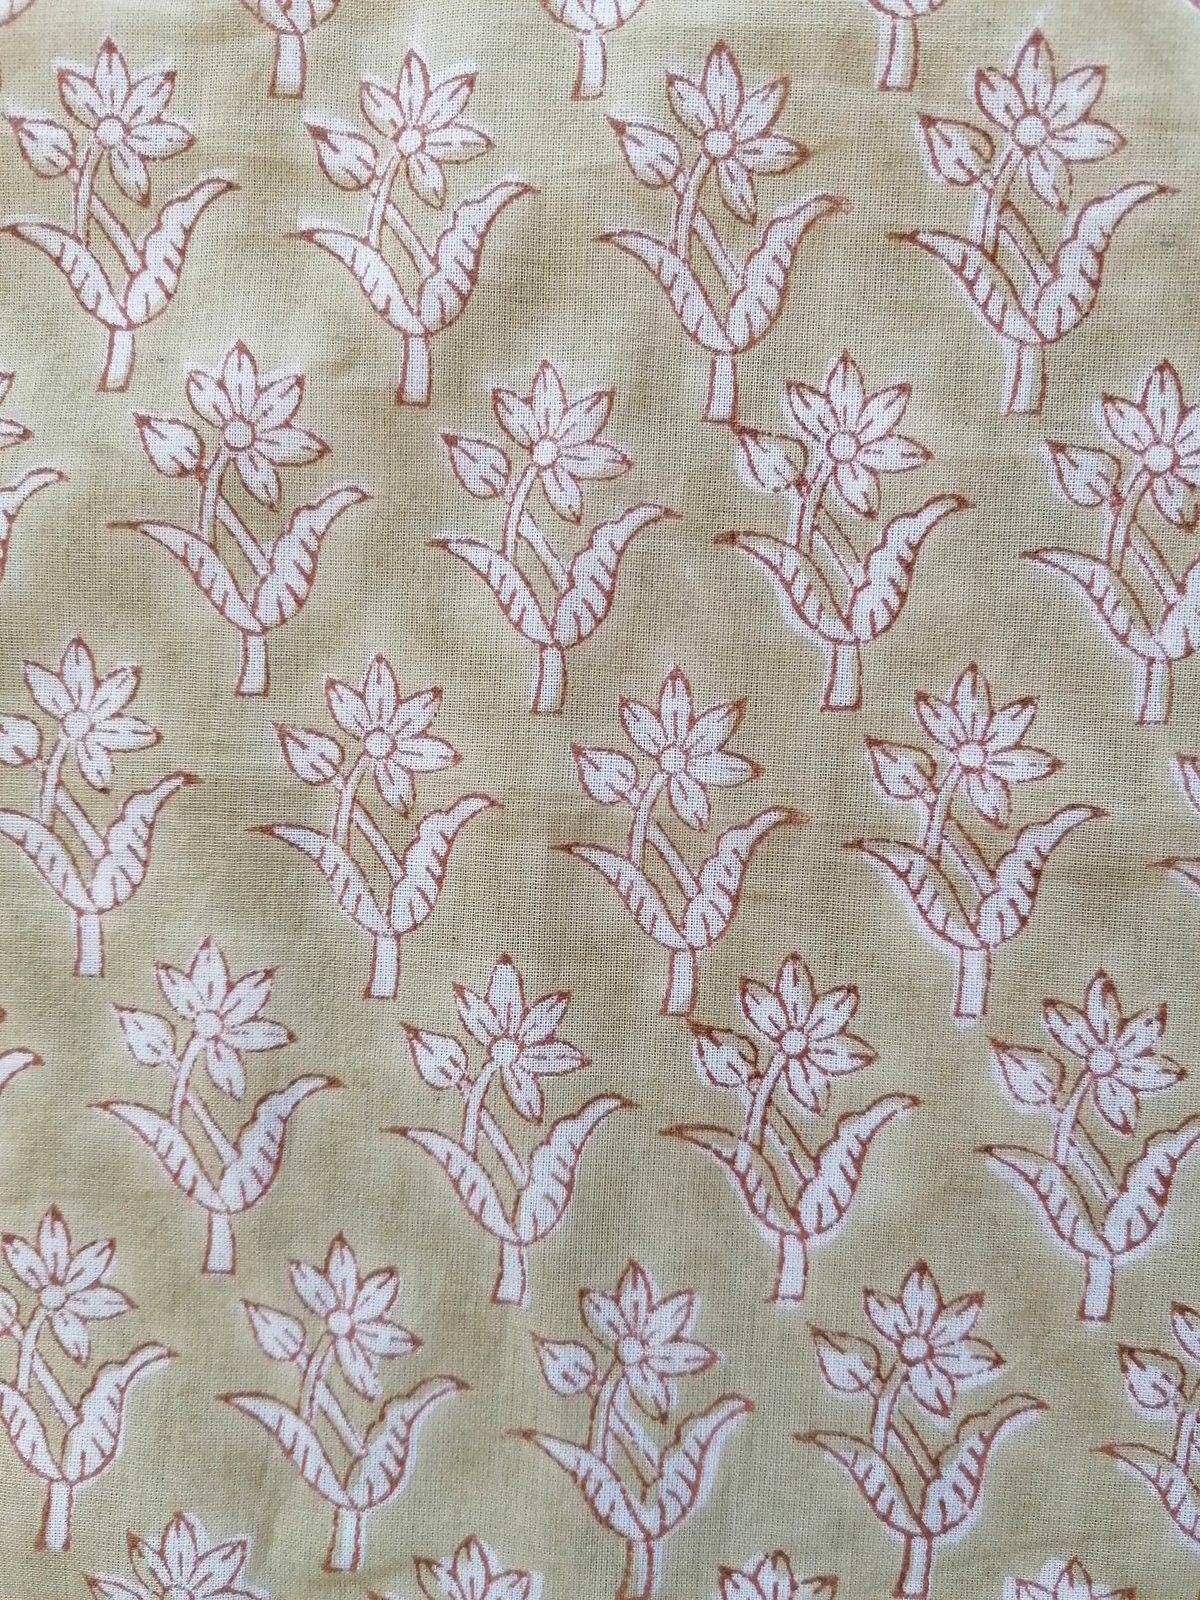 Image of Namasté fabric petites fleurs anis